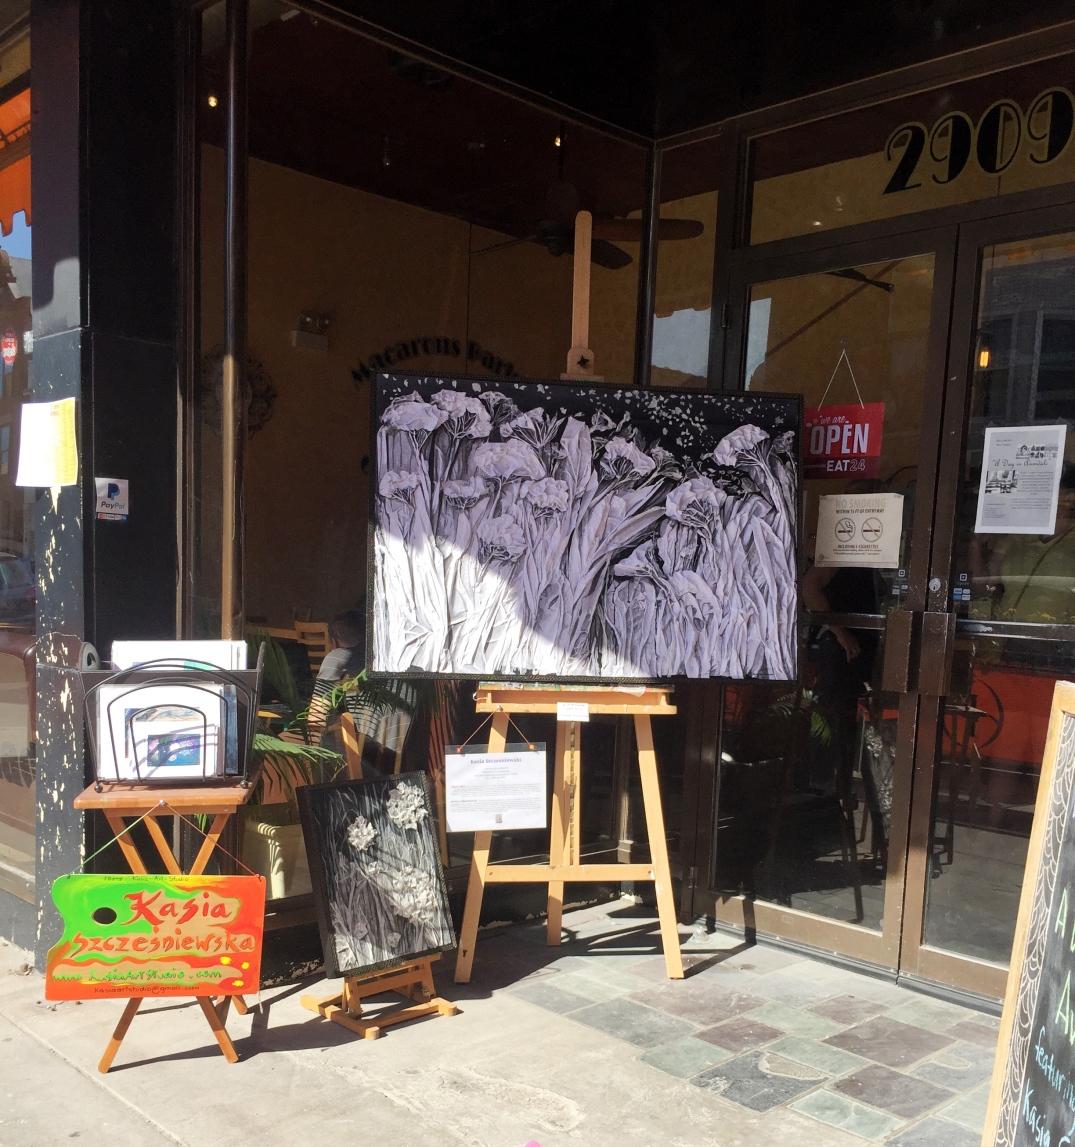 Art by Kasia at La Farine Bakery